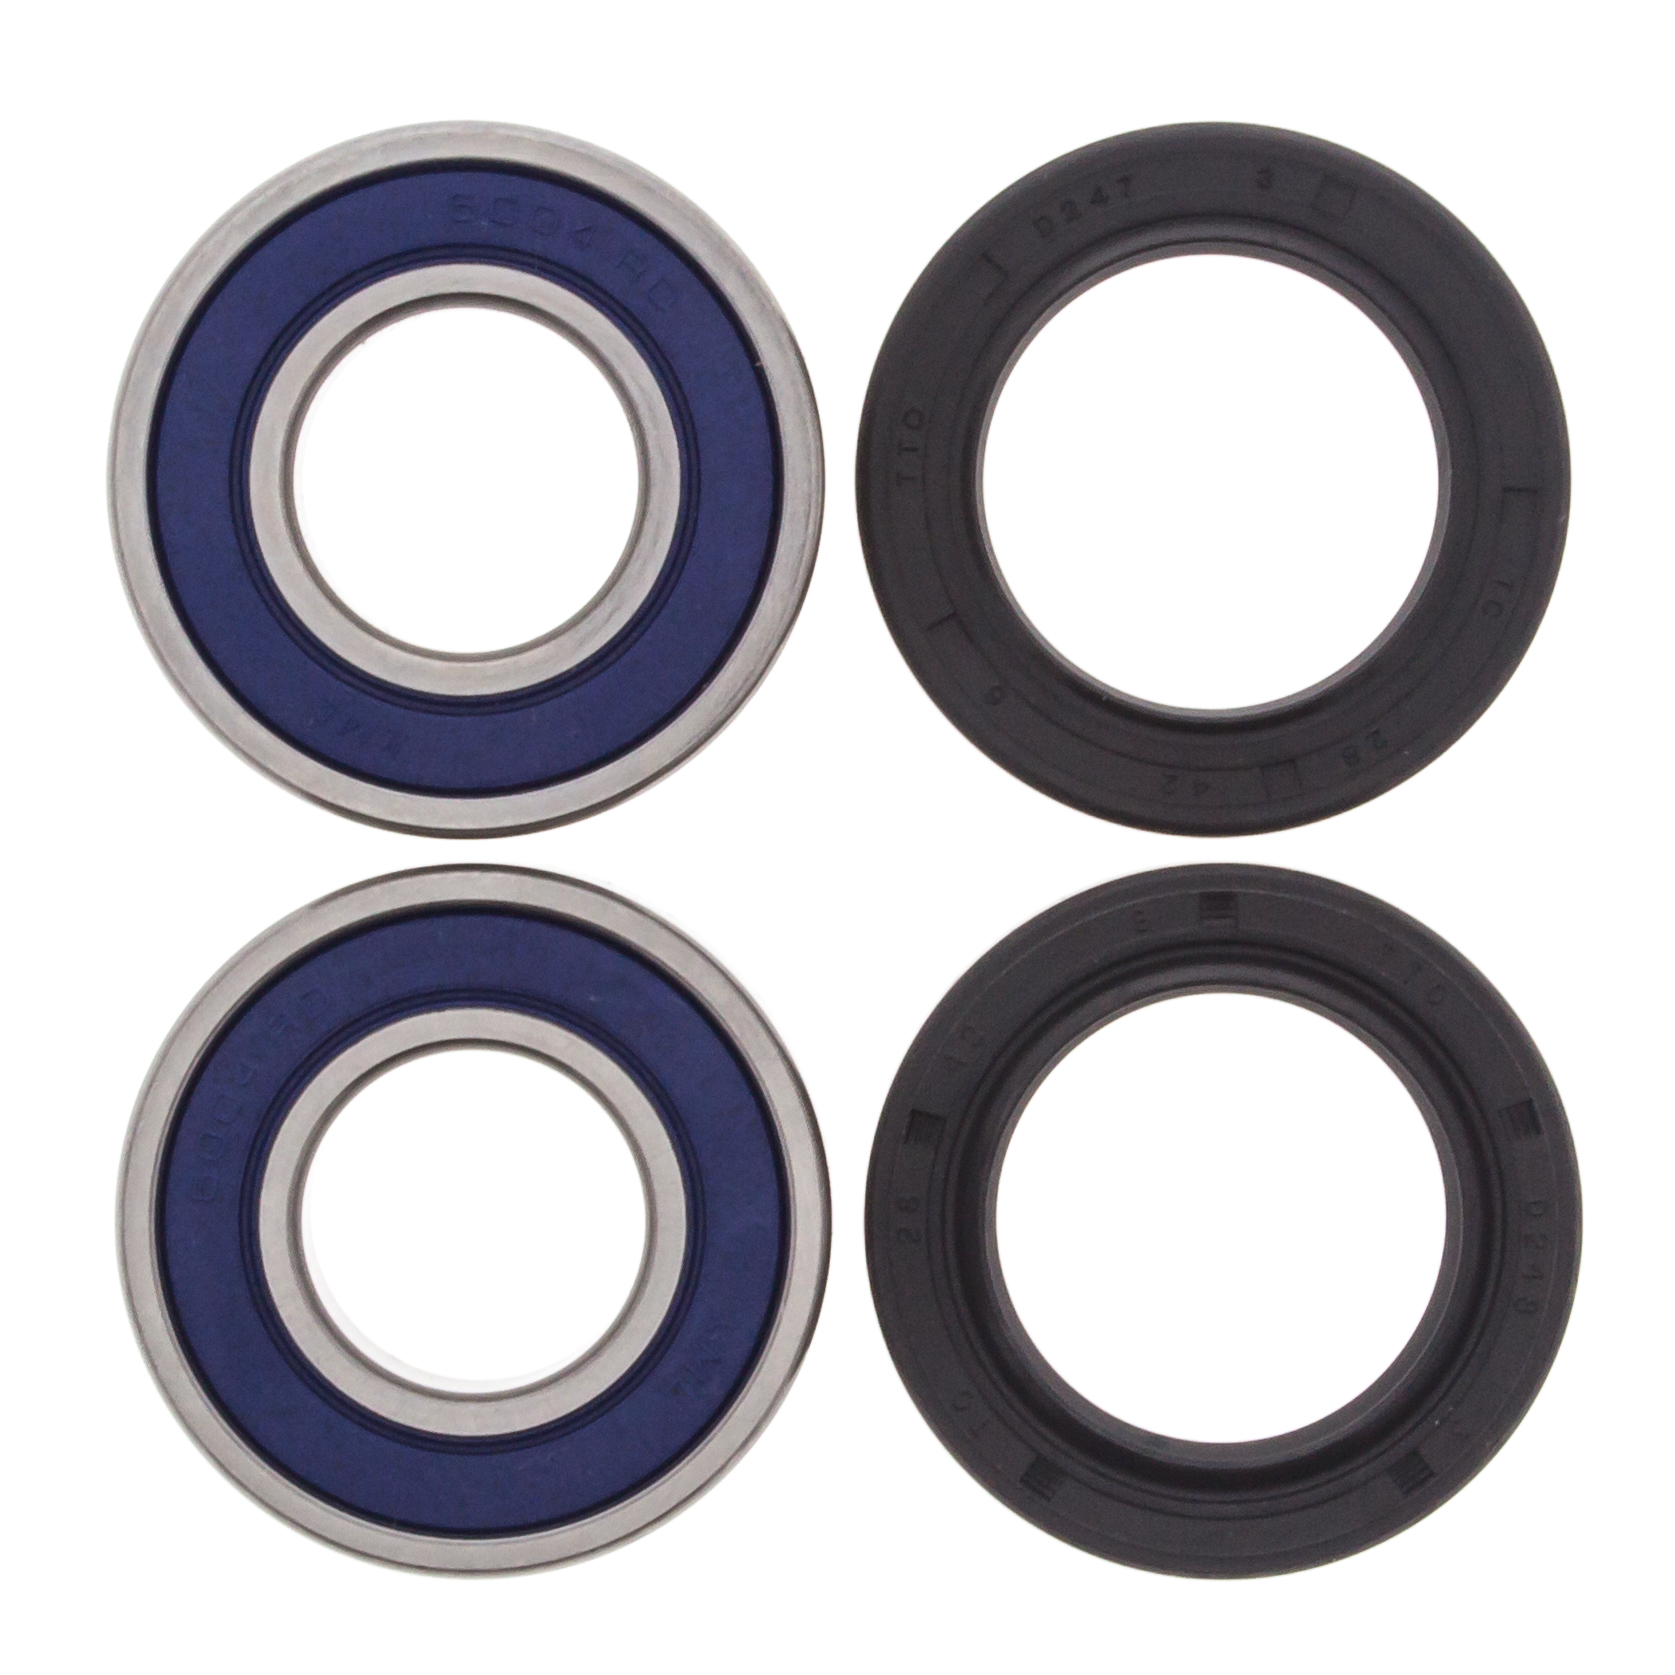 93-00 Honda TRX300 Fourtrax 300 2x4 BOTH Front Wheel Bearing /& Seal Kits